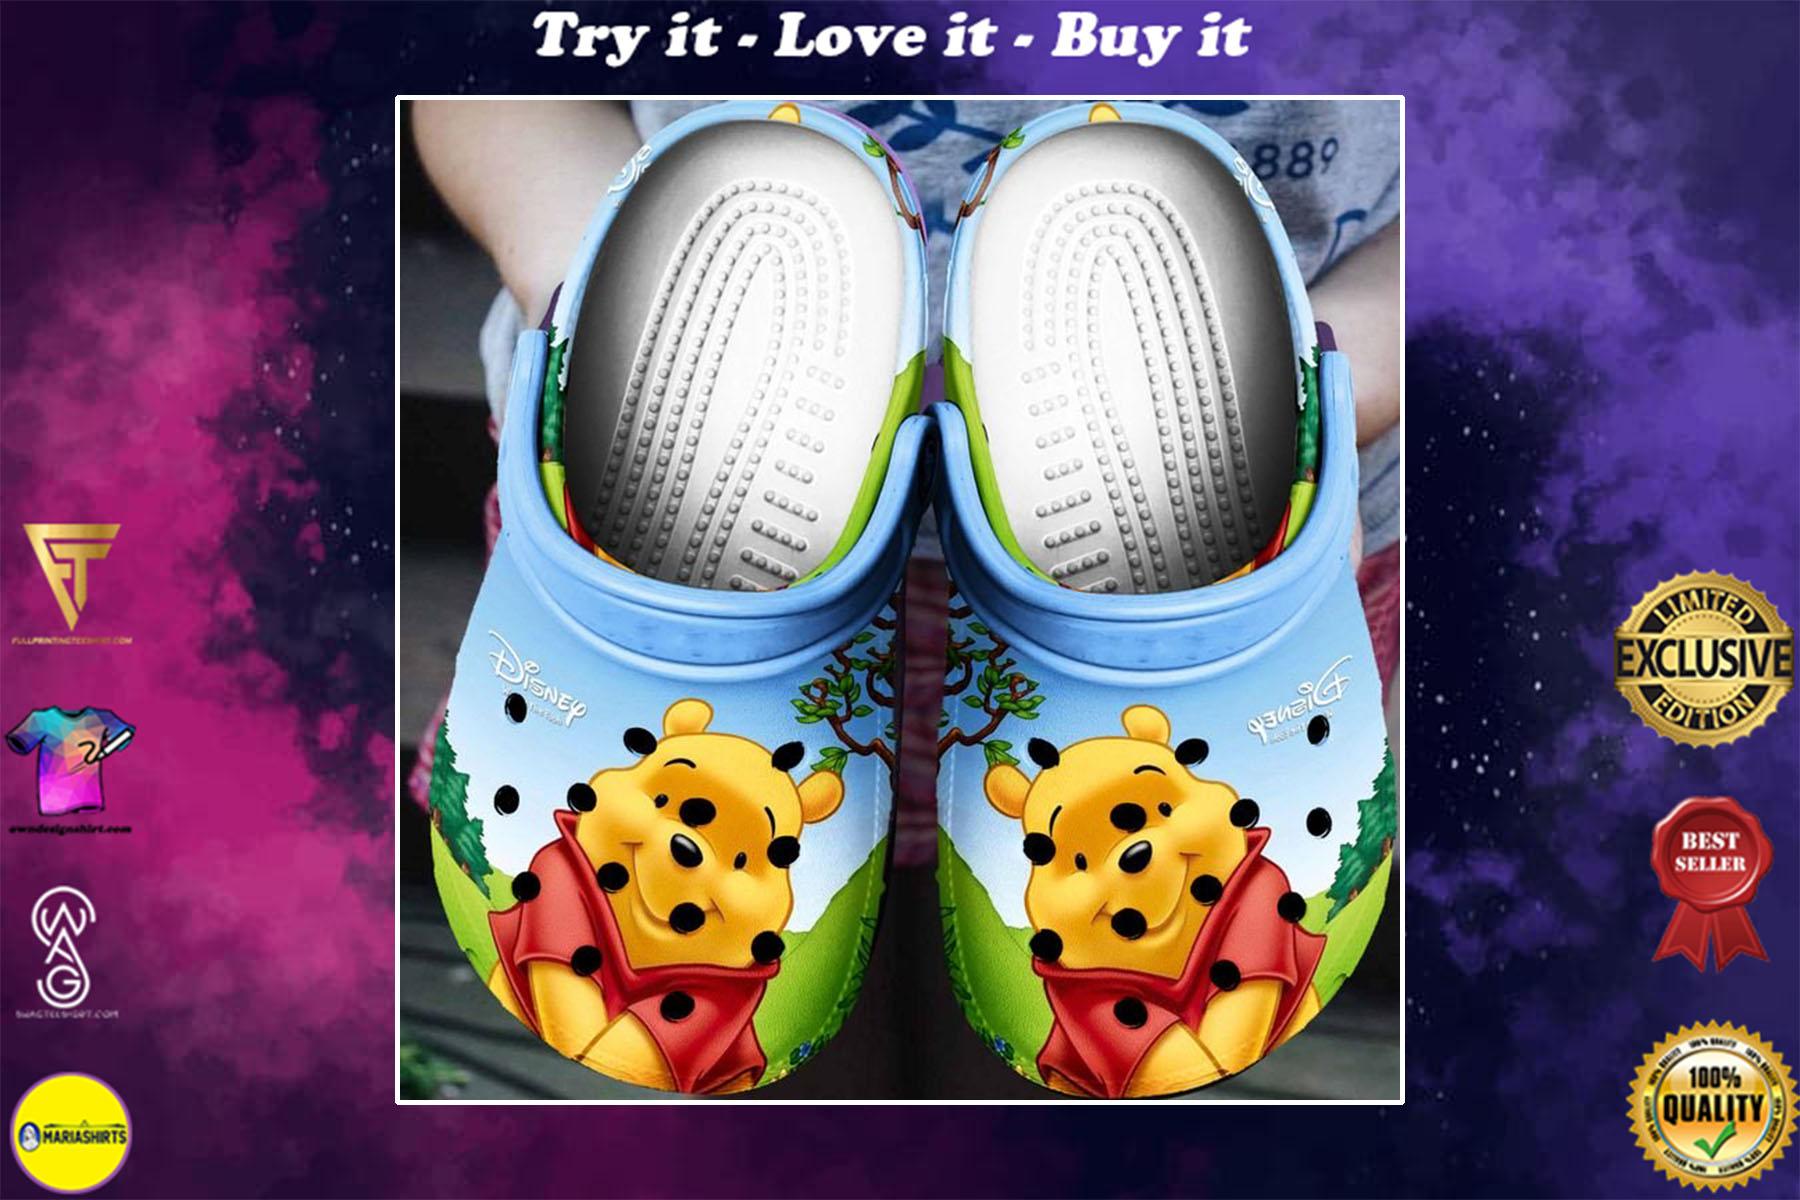 [special edition] the pooh cartoon crocs shoes - maria